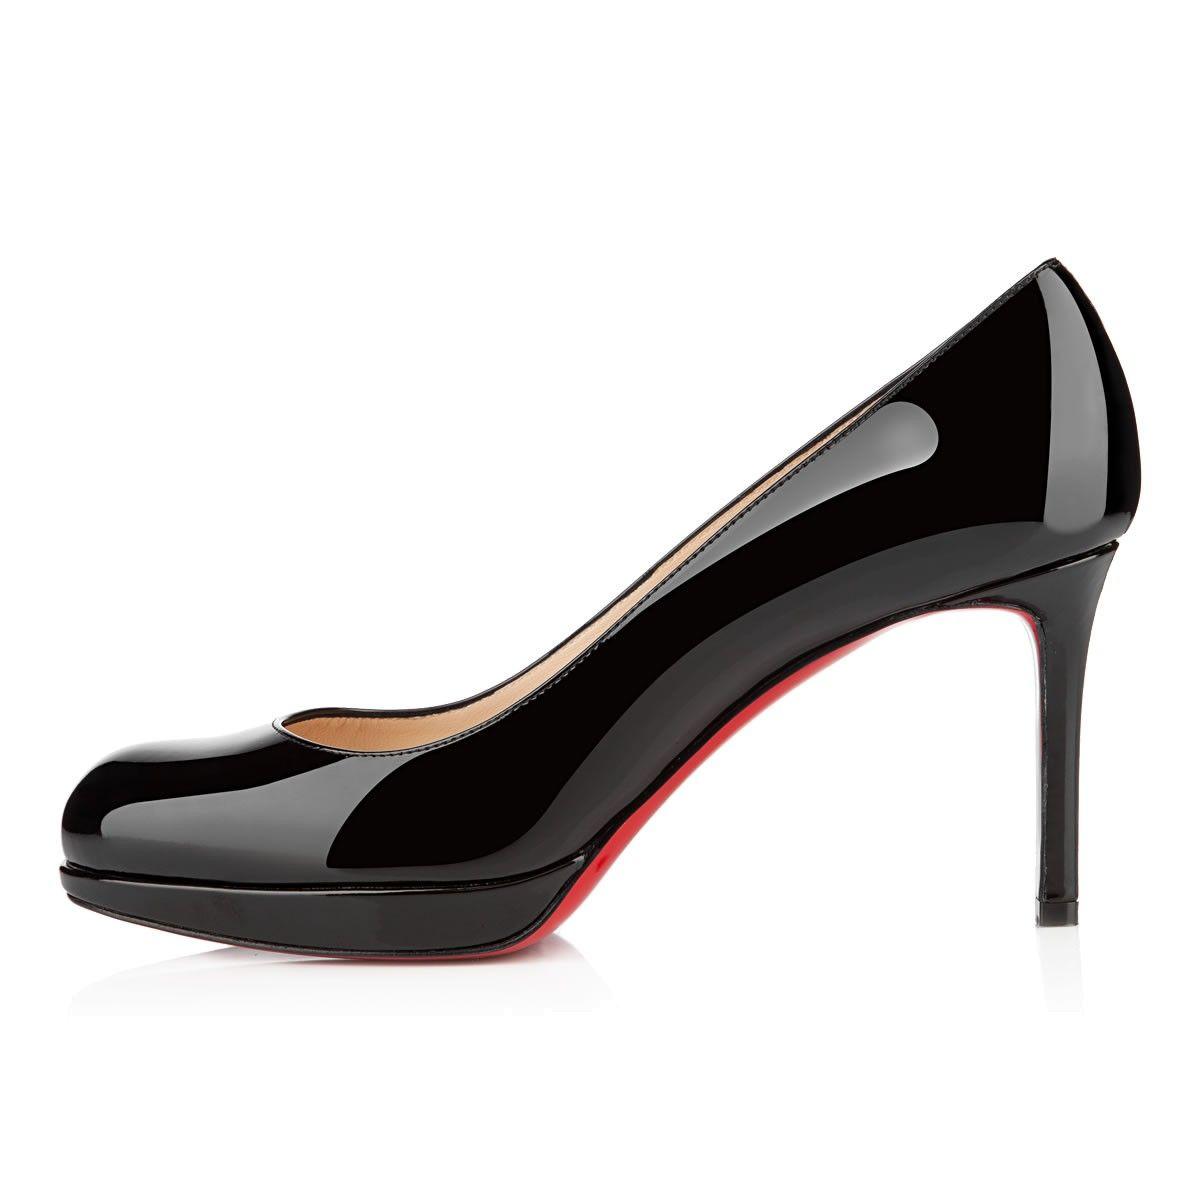 SIMPLE PUMP 85 Black Patent Leather Women Shoes Christian Louboutin